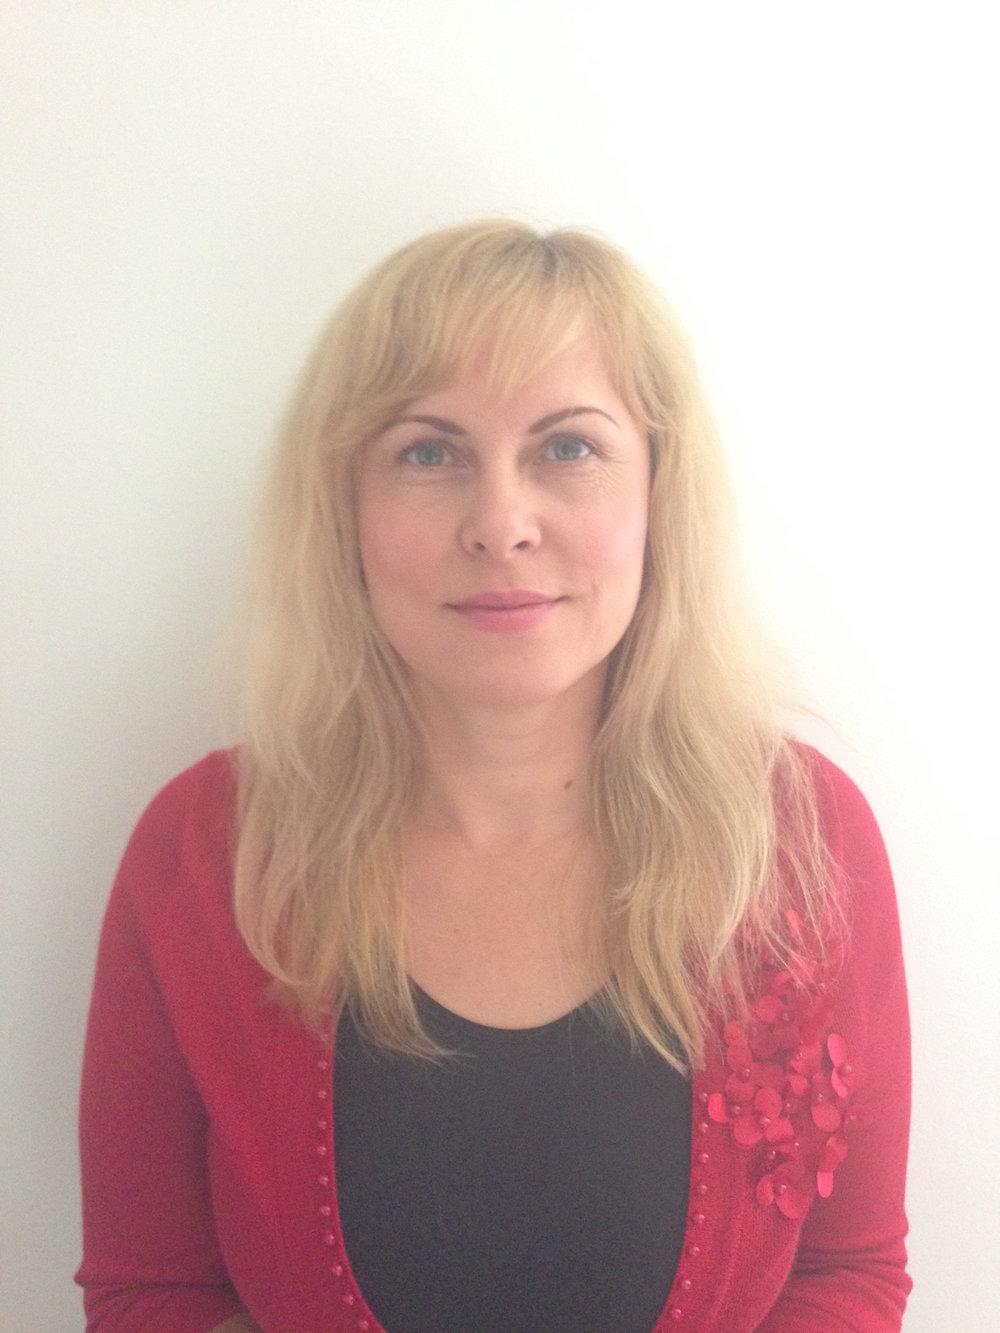 Marika speaks Czech and Slovakian.   She has a BA in Social Work from Slovakia